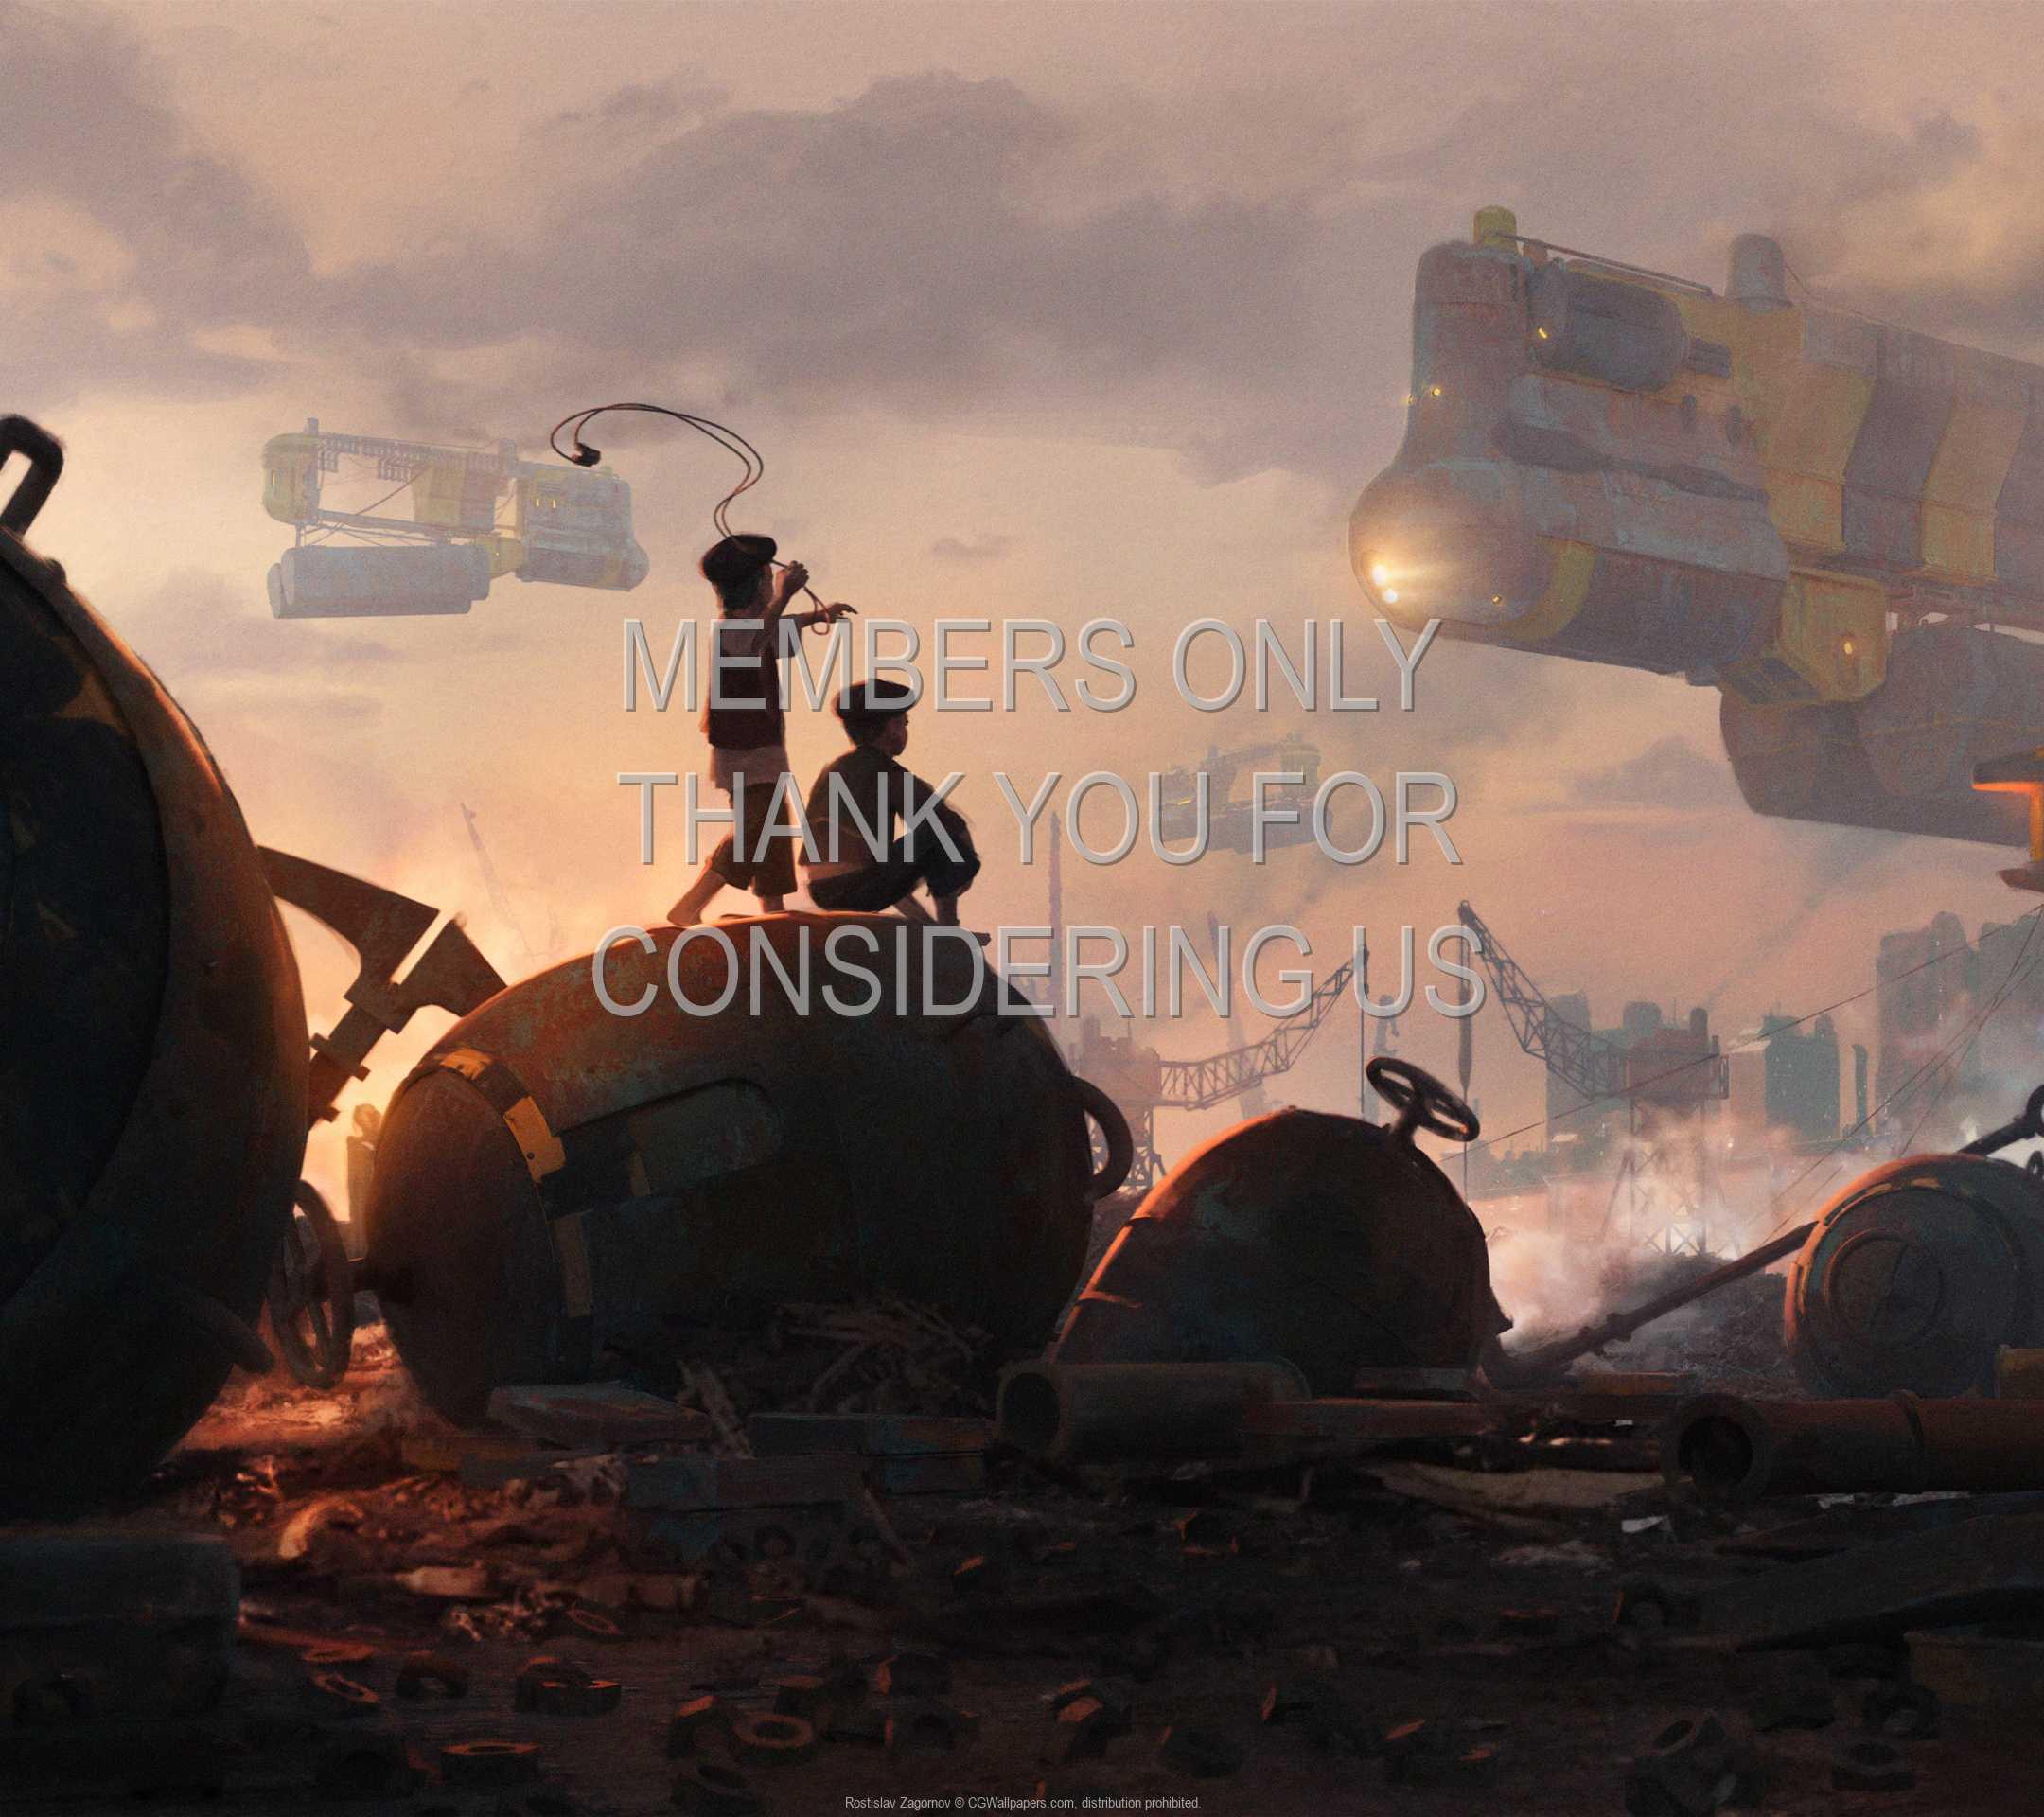 Rostislav Zagornov 1080p Horizontal Mobile fond d'écran 08